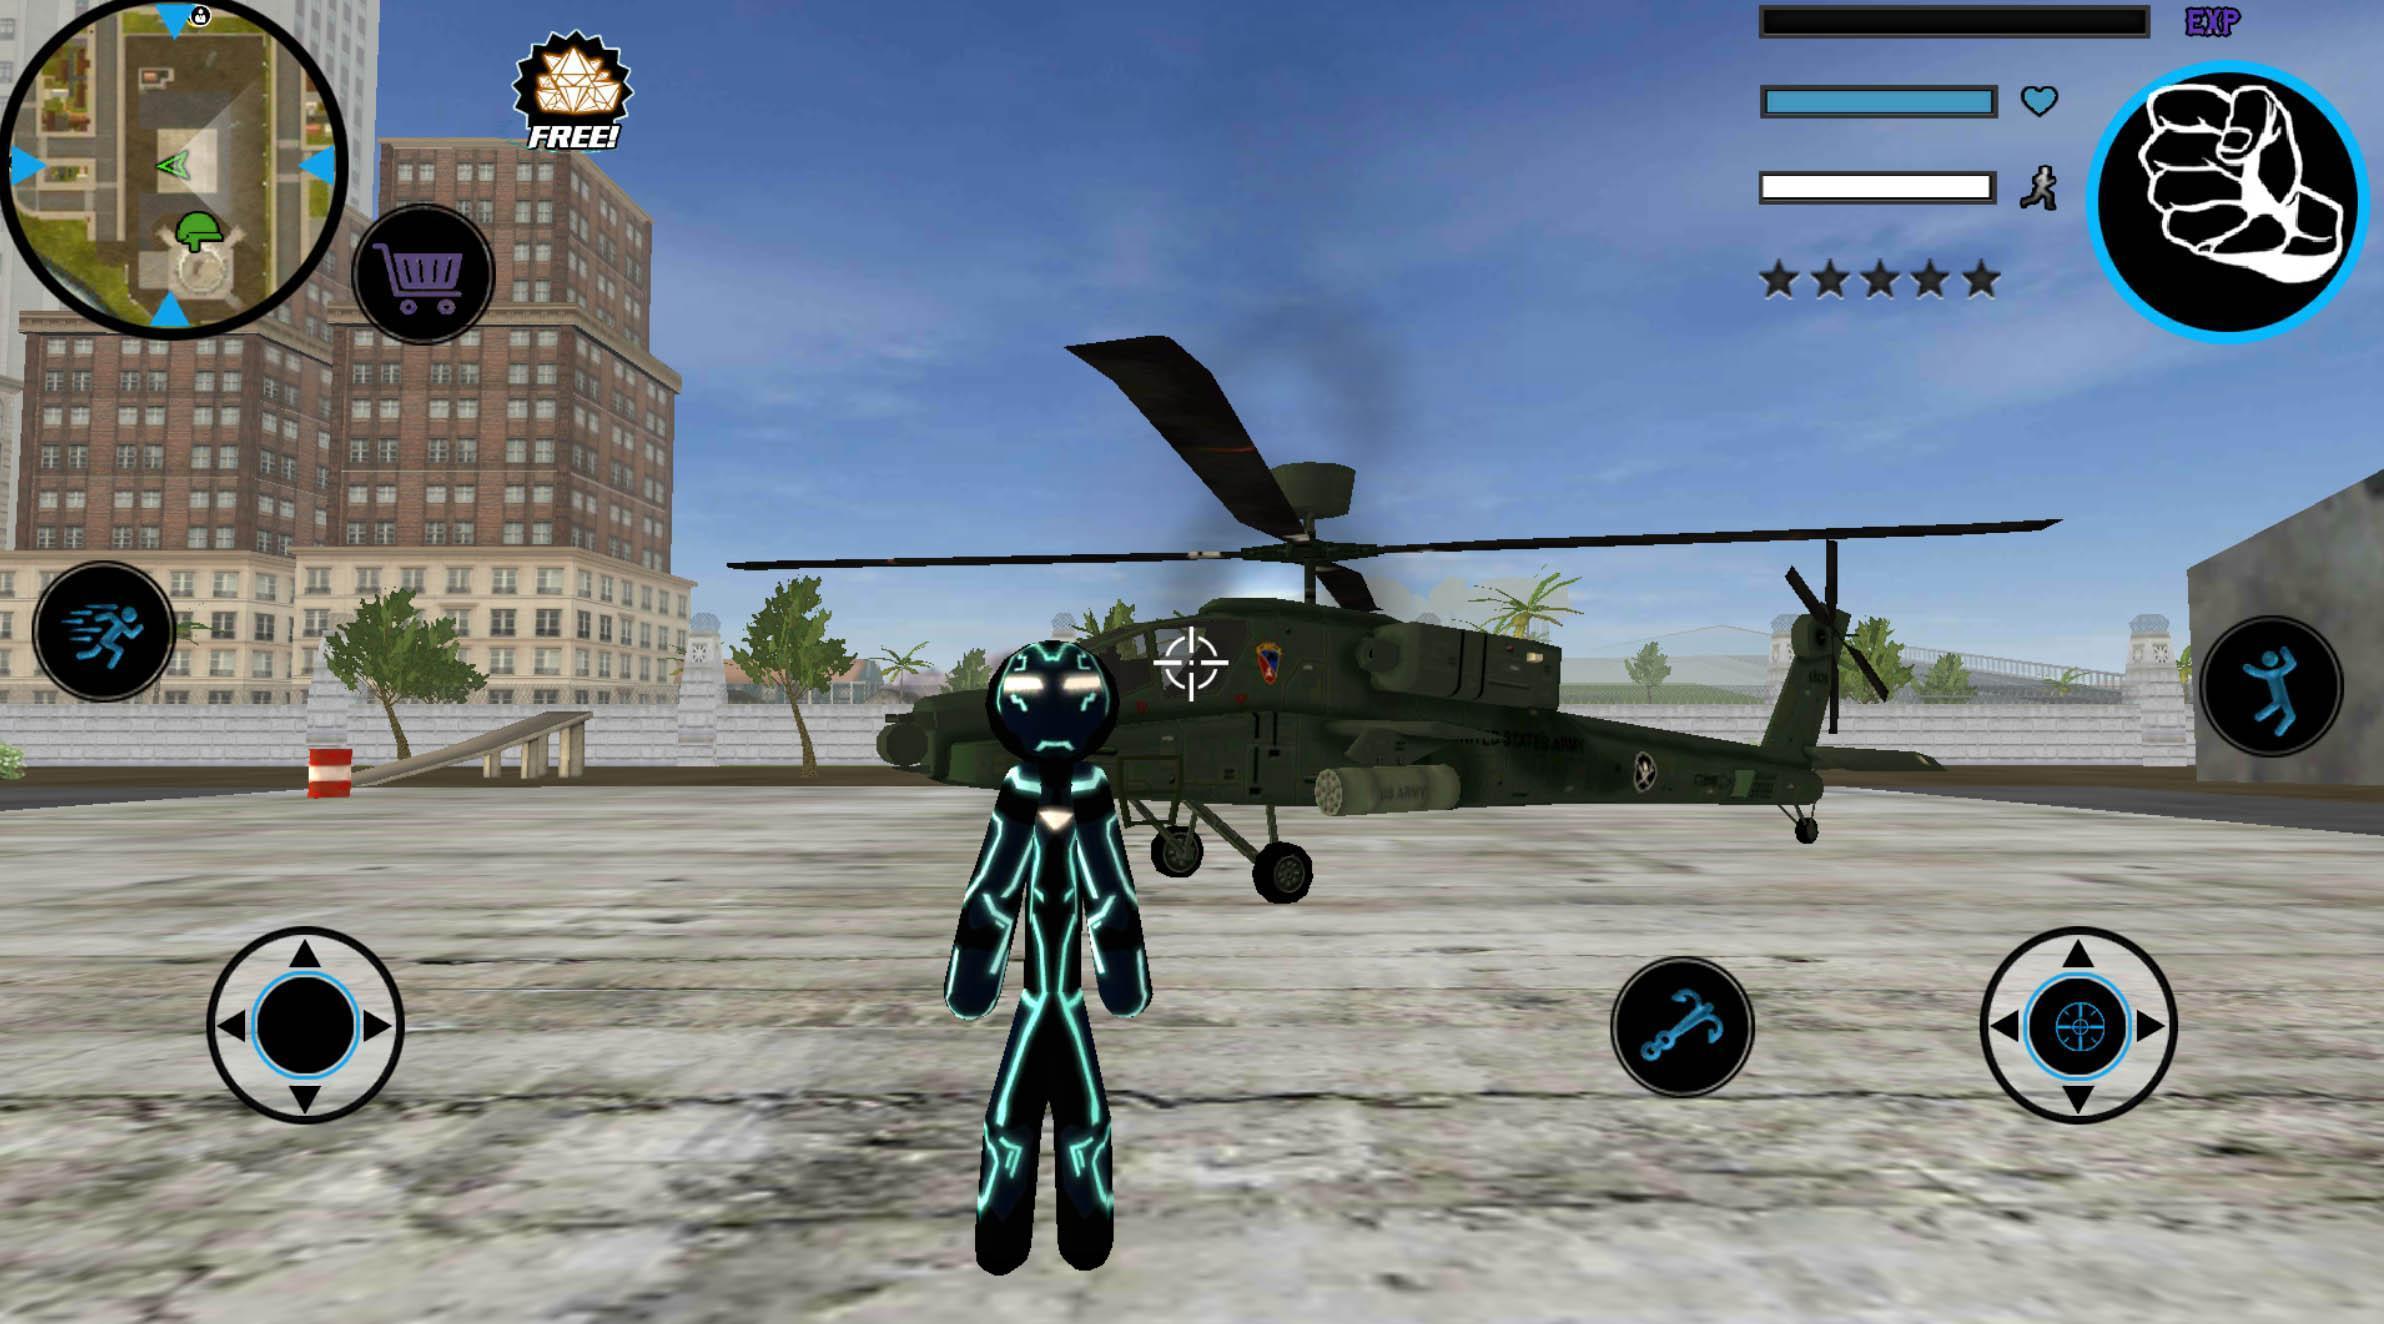 Neon Iron Stickman Rope Hero City Gangstar Mafia 1.6 Screenshot 6